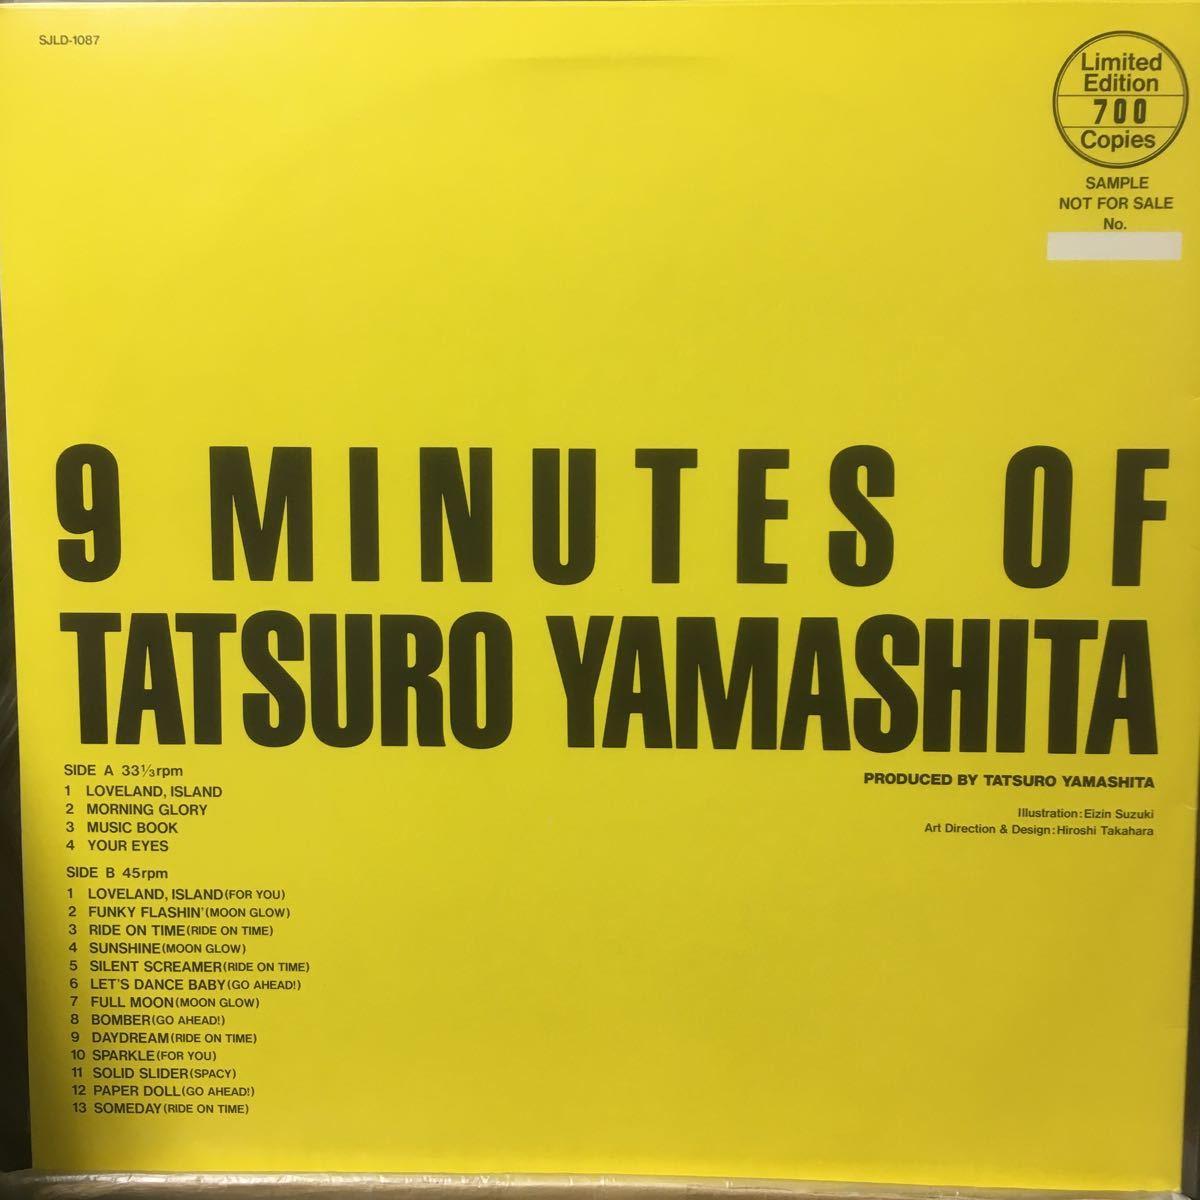 DJ COPY★山下達郎/9 MINUTES OF TATSURO YAMASHITA 限定700枚 ピクチャー・レコード SJLD-1087_画像4